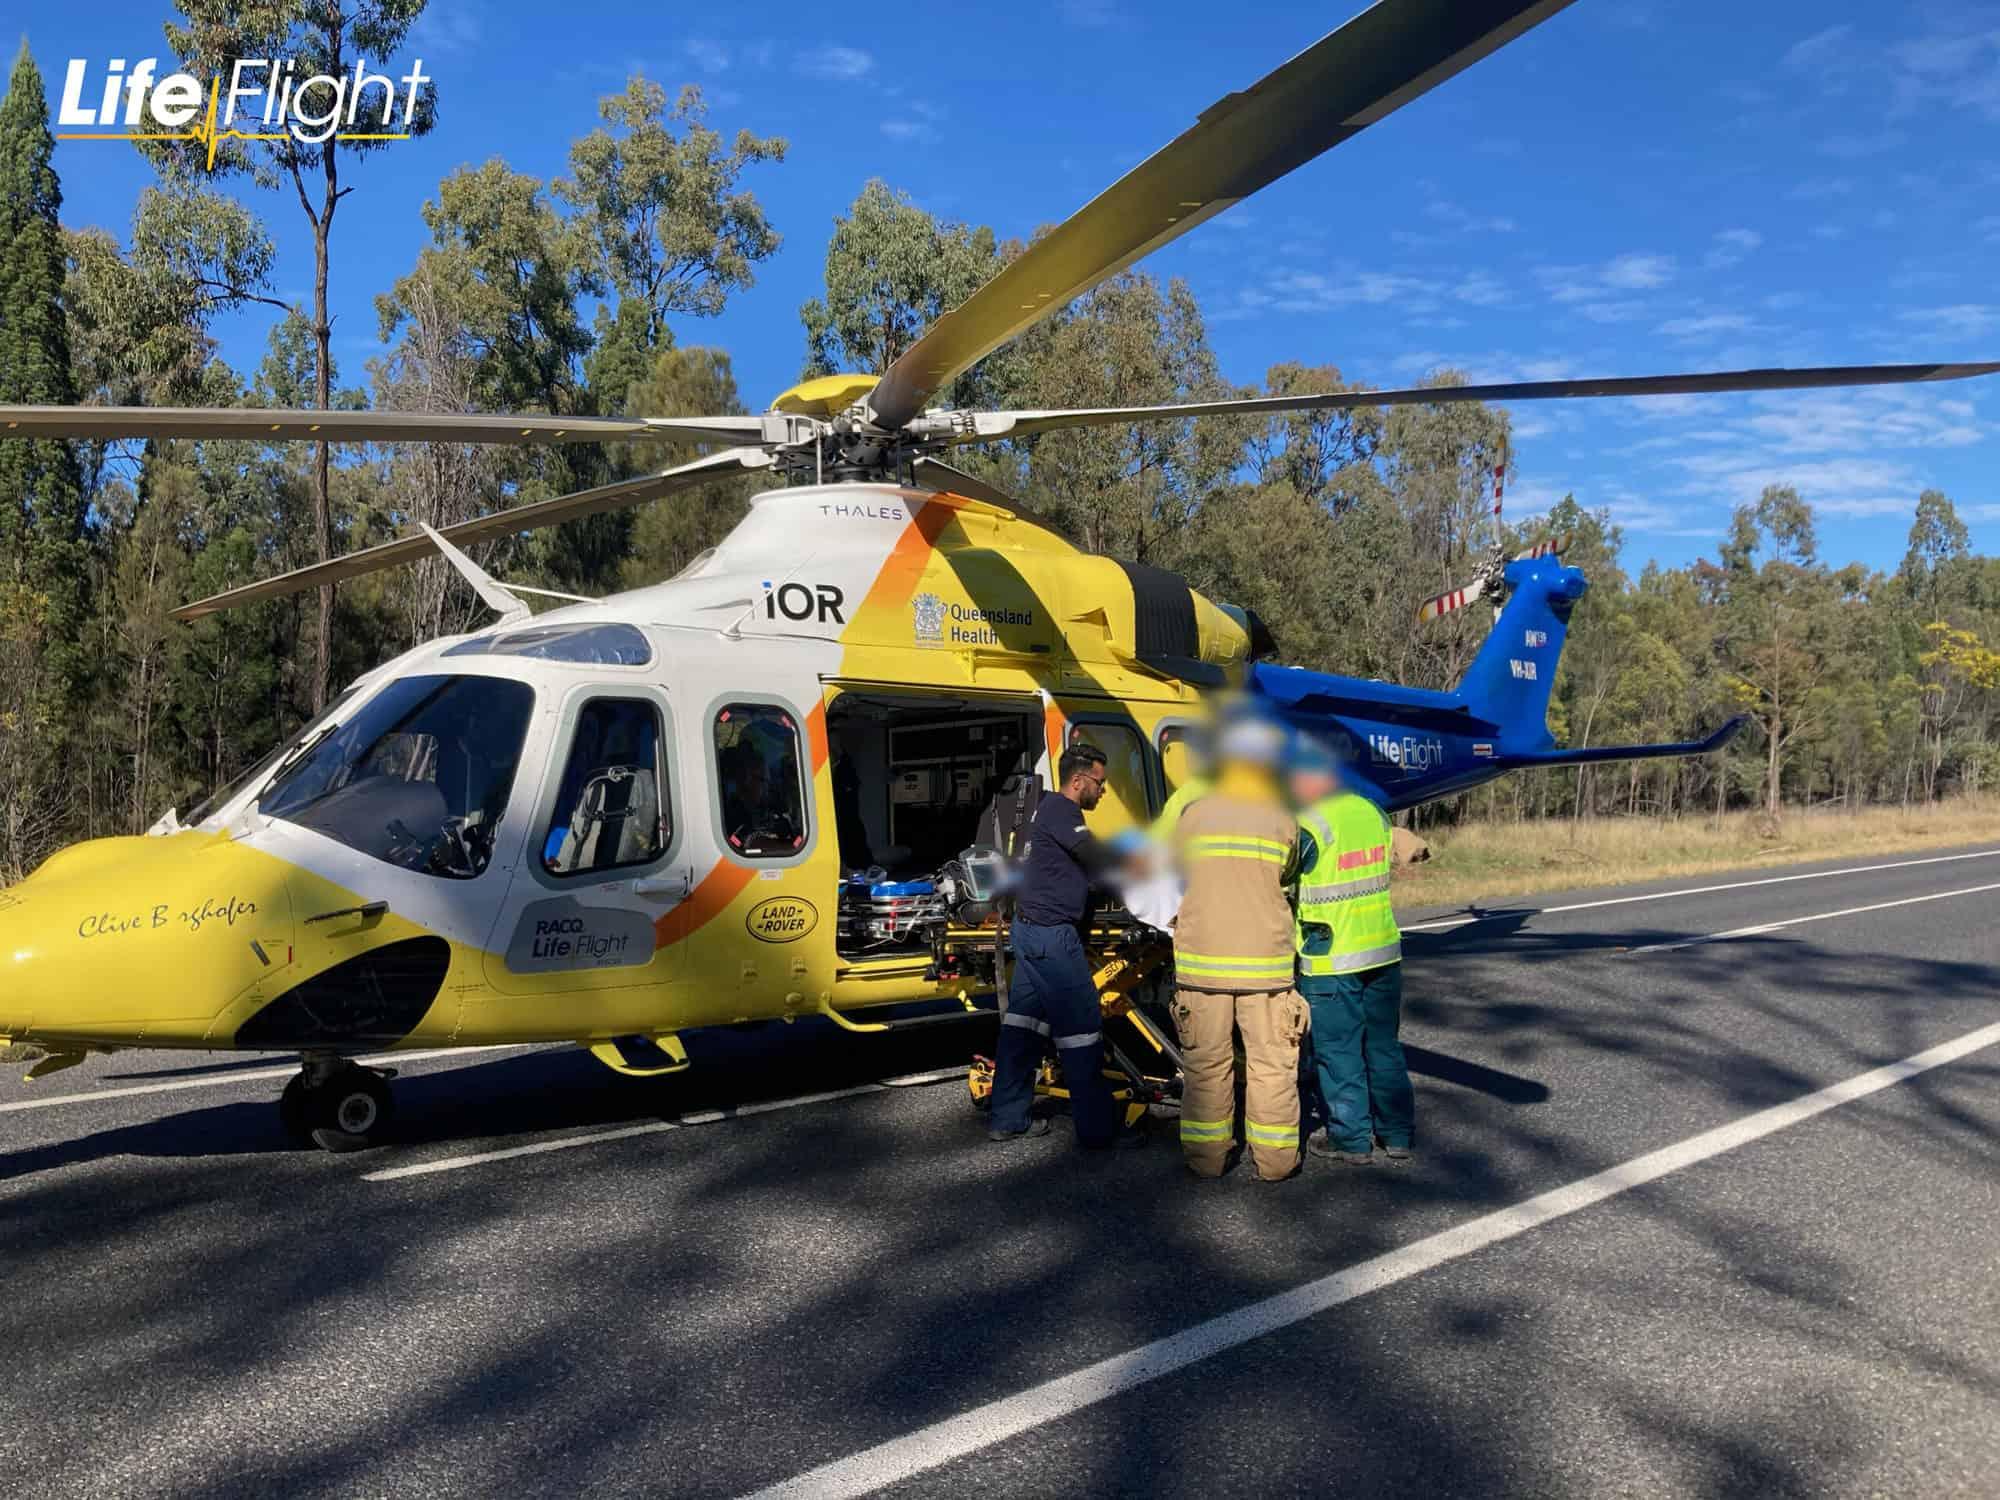 LifeFlight airlifts child survivor from horror crash